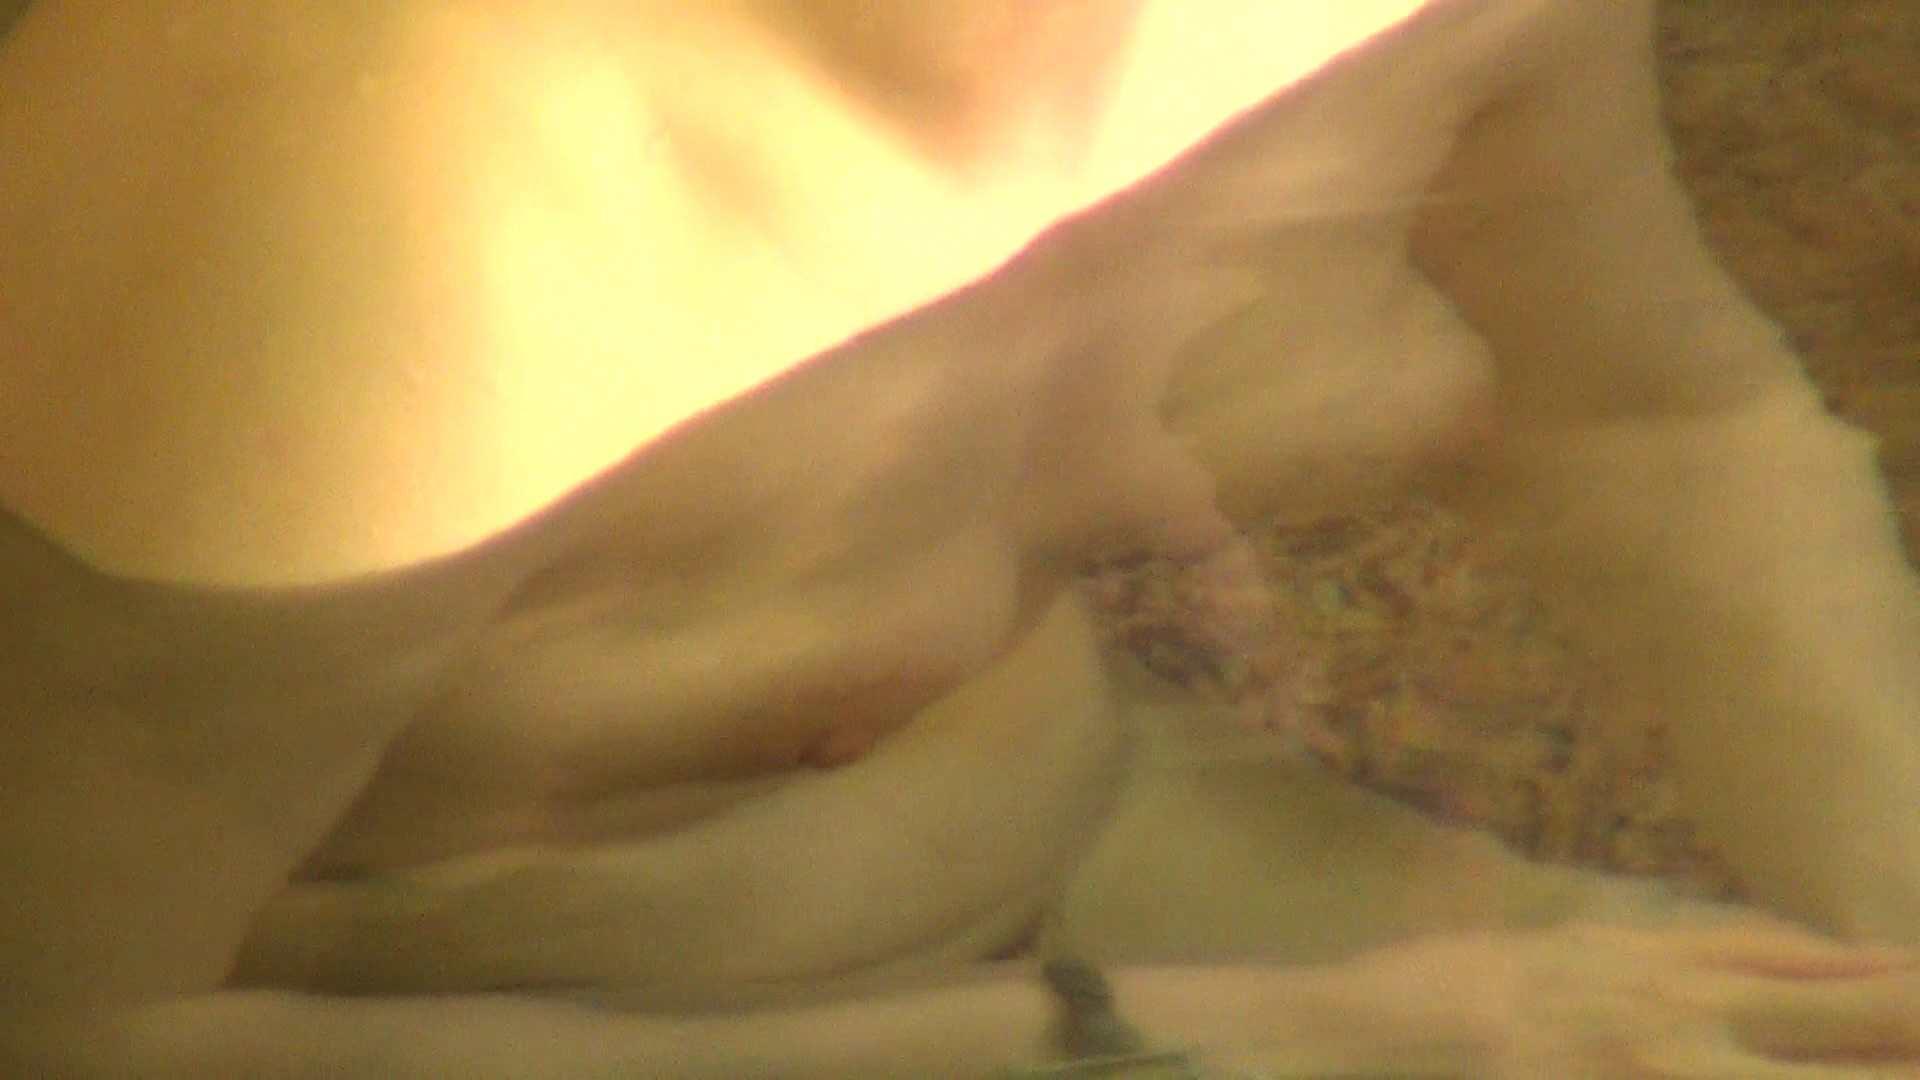 Vol.81 【閲覧注意】極熟肉オンパレード! 細身体型 ぱこり動画紹介 77枚 63